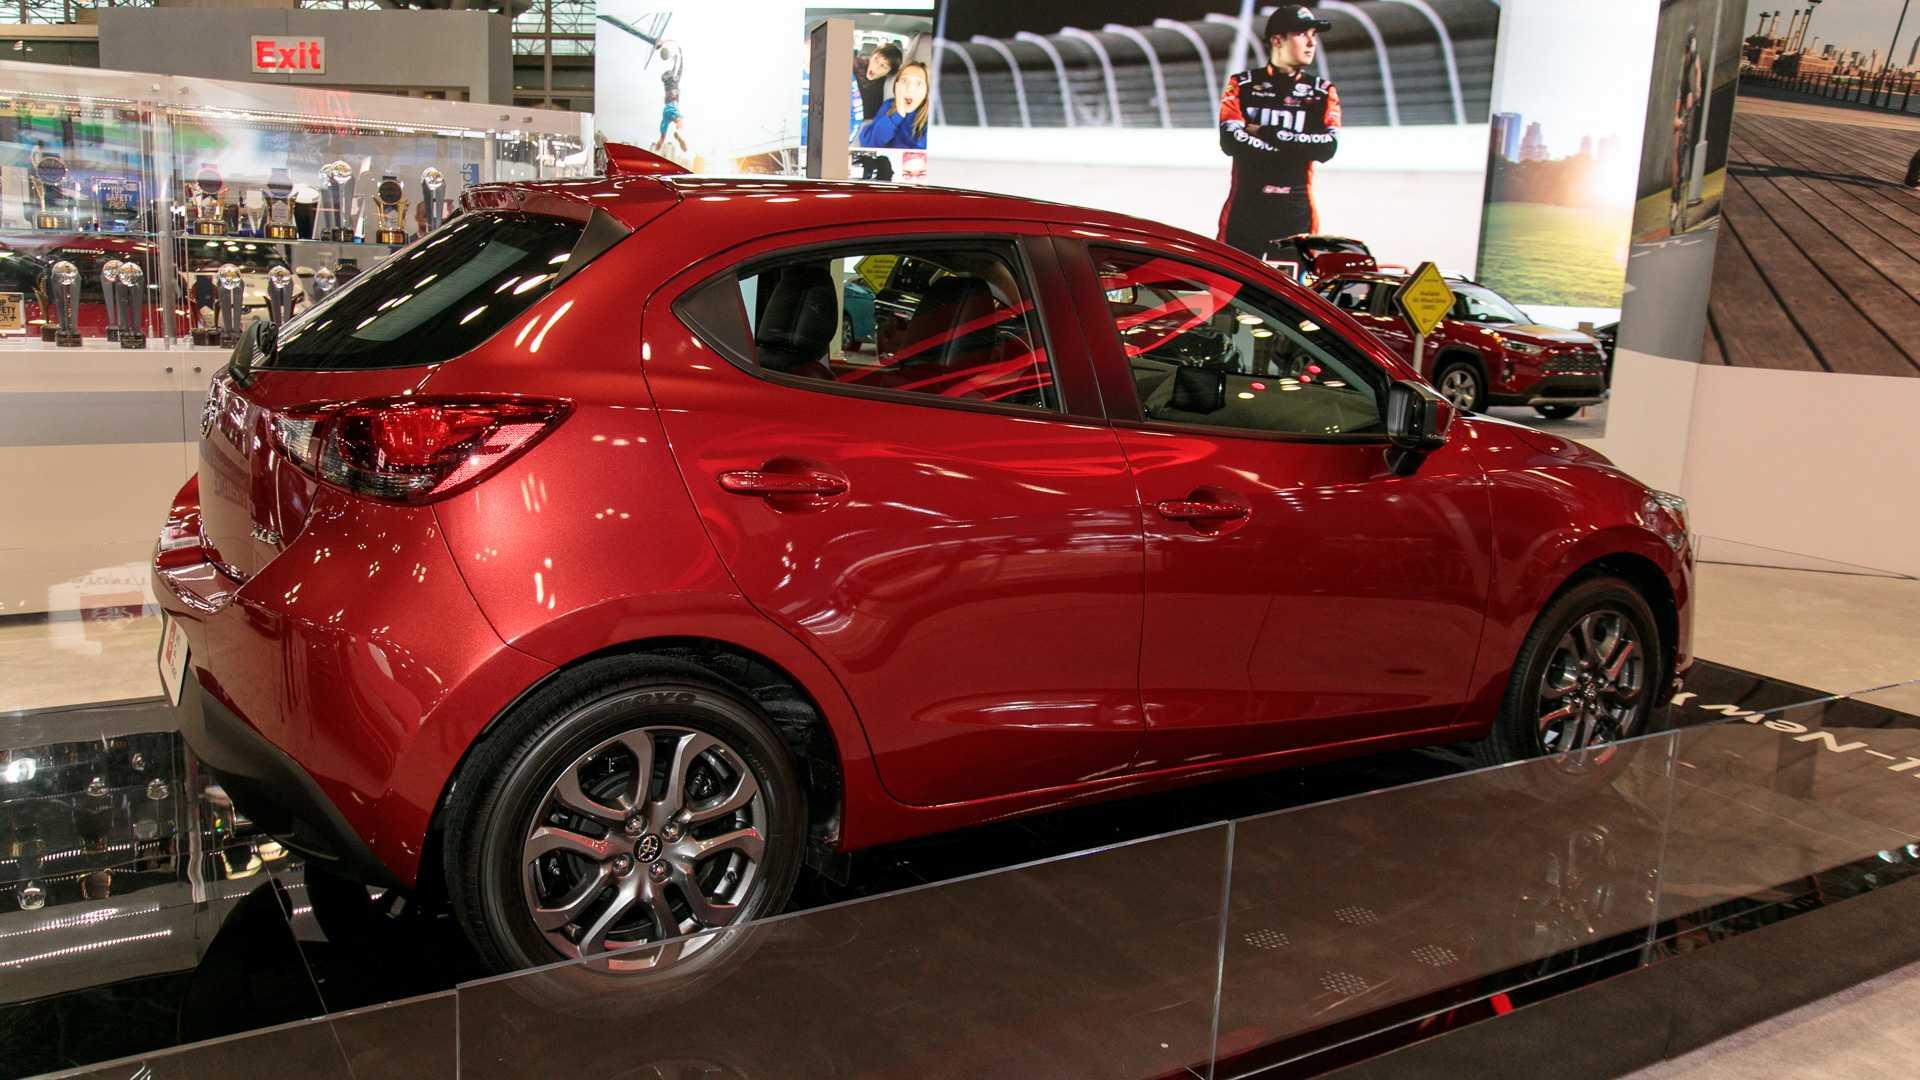 18 New Yaris 2020 Mazda 2 Pricing by Yaris 2020 Mazda 2